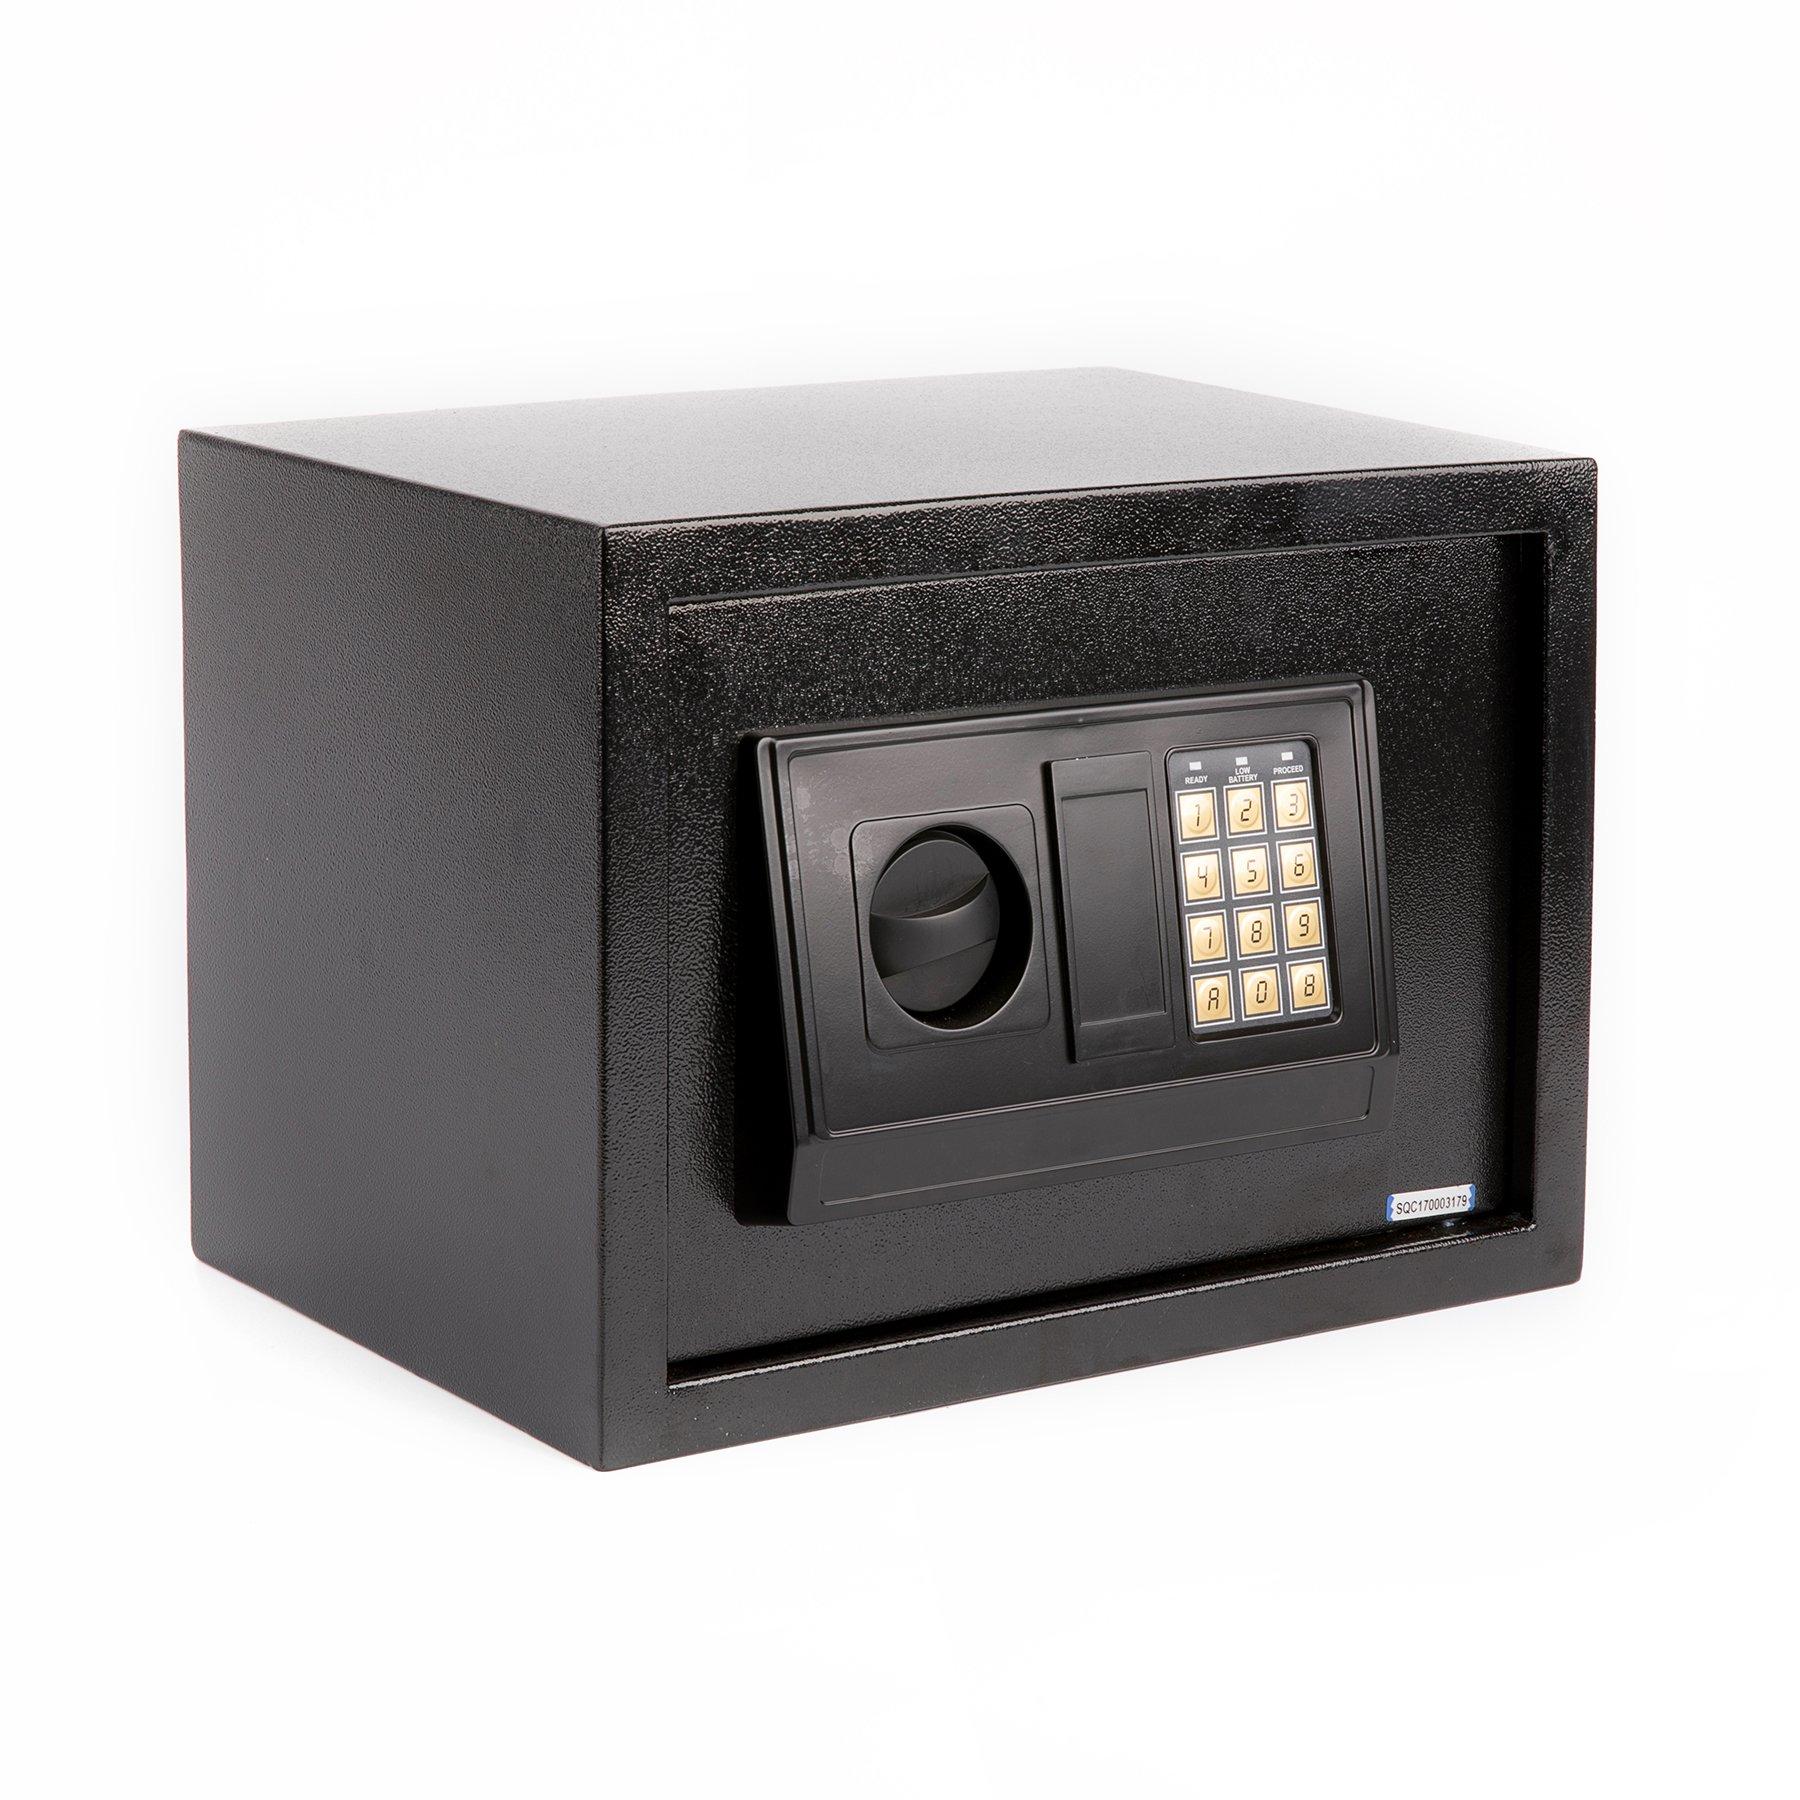 Windaze Electronic Digital Safe Box Keypad Lock Home Office Hotel Hide Cash Gun Valuables, 1.2 Cubic Feet